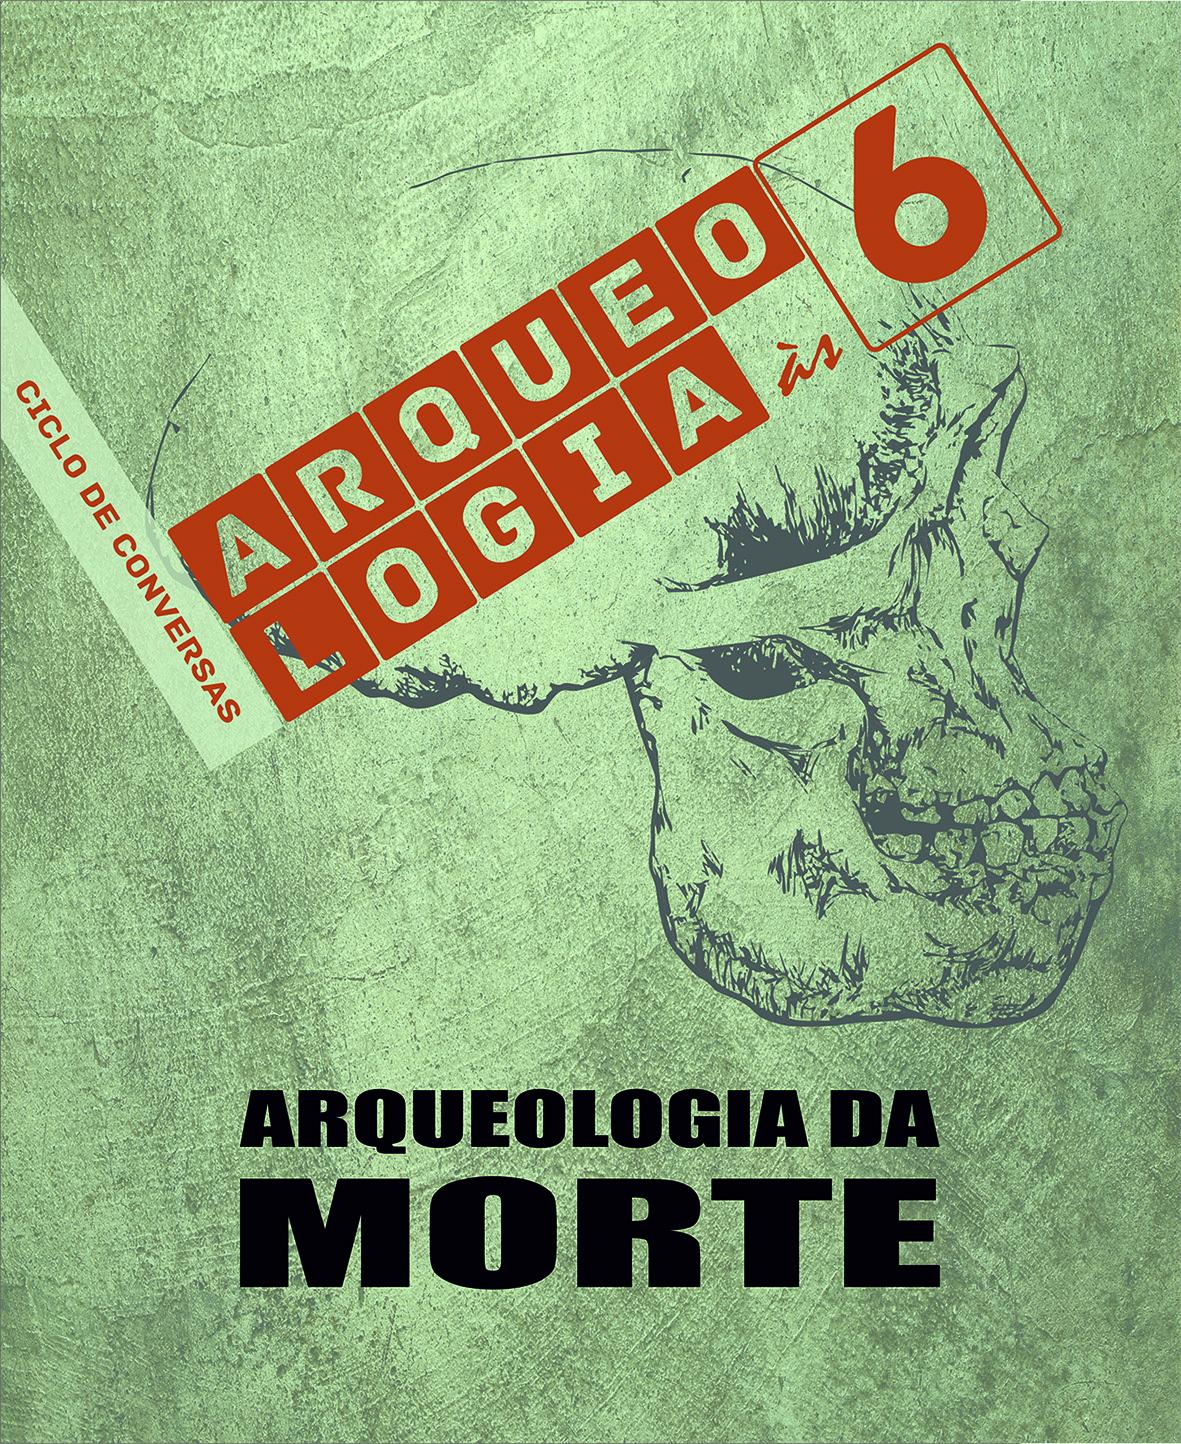 Arqueologia às 6 – session 5 podcast available [portuguese]